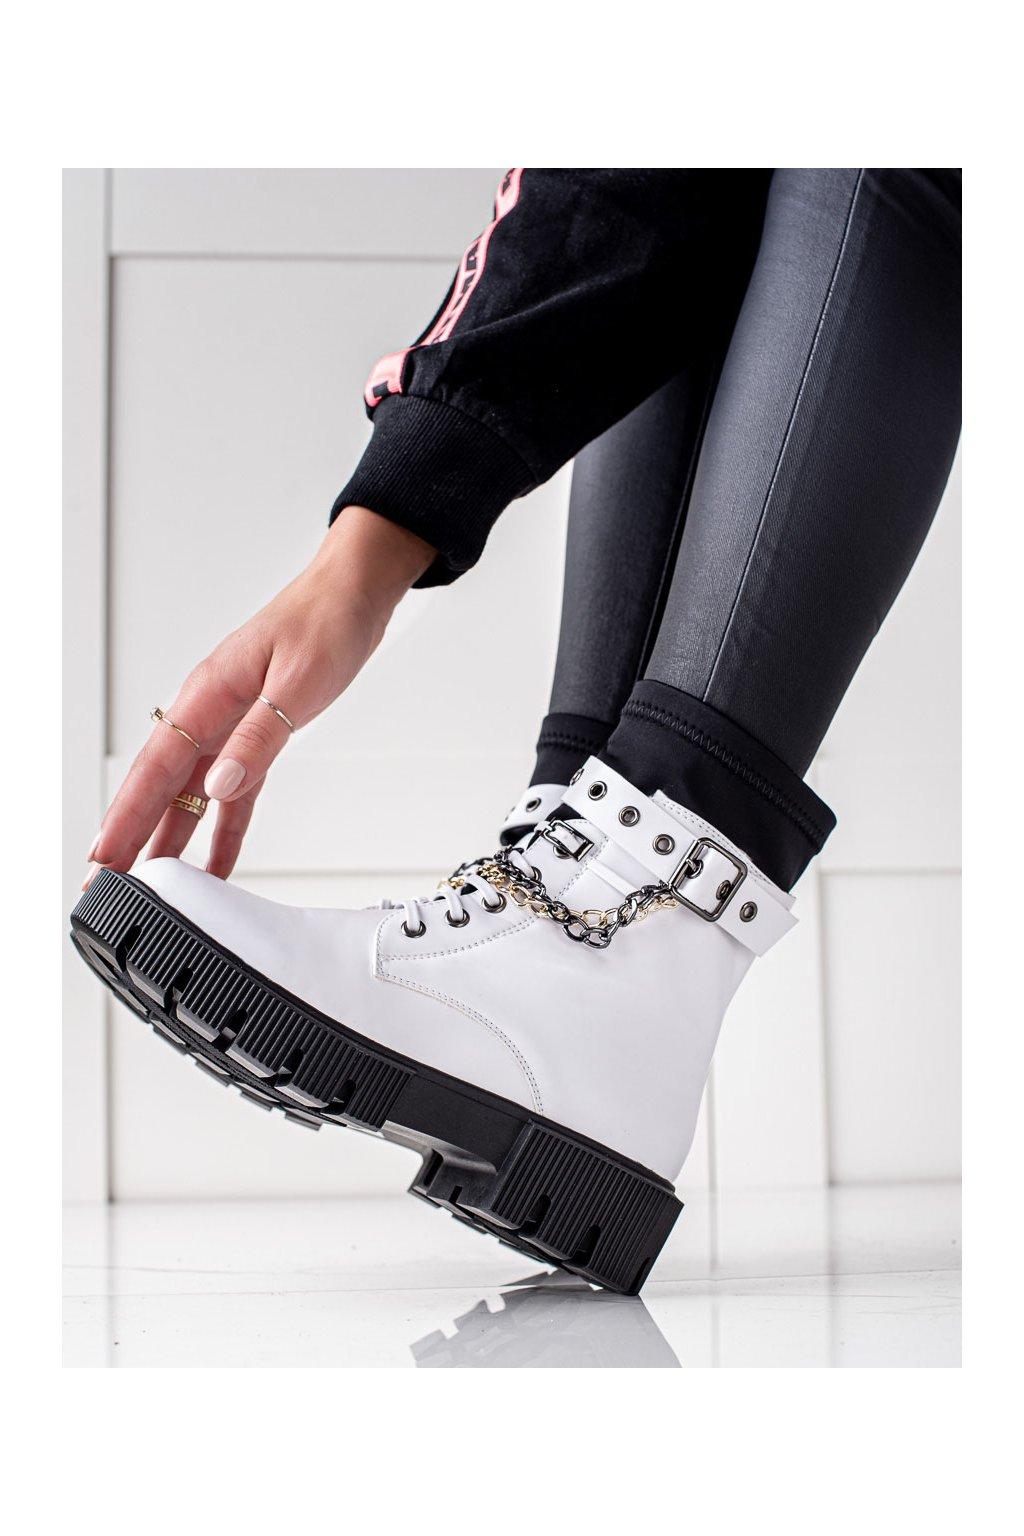 Biele dámske topánky Seastar kod JJ01W